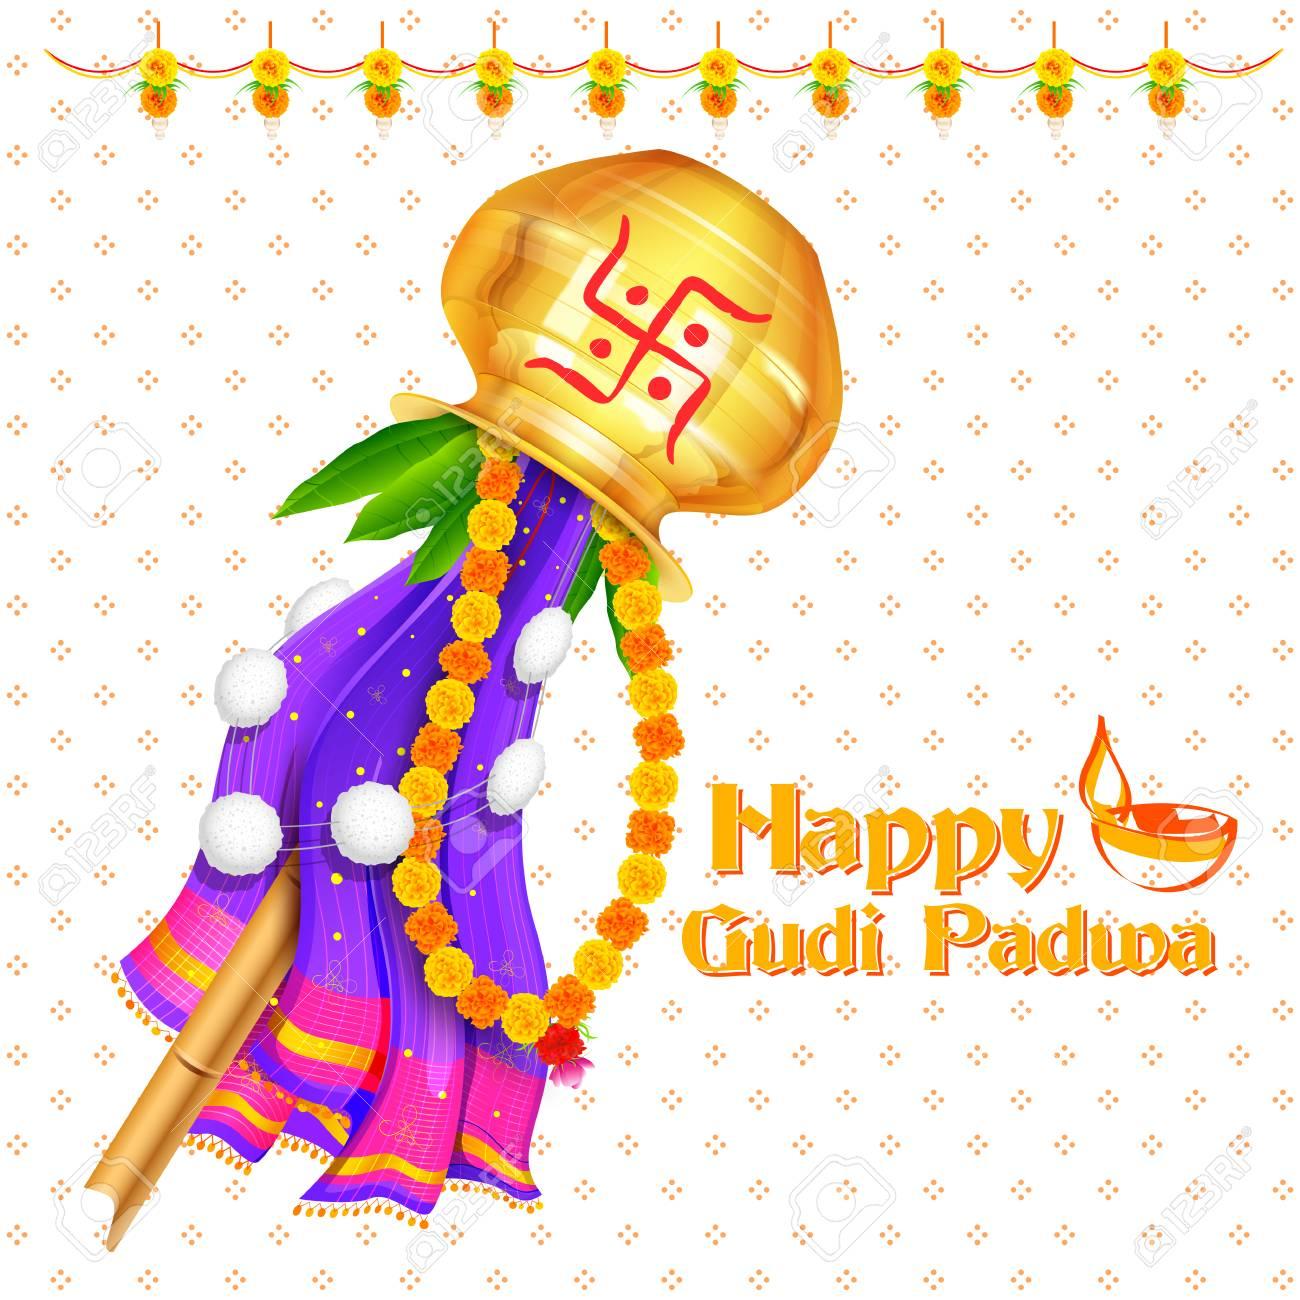 Gudi Padwa celebration of India - 73904414